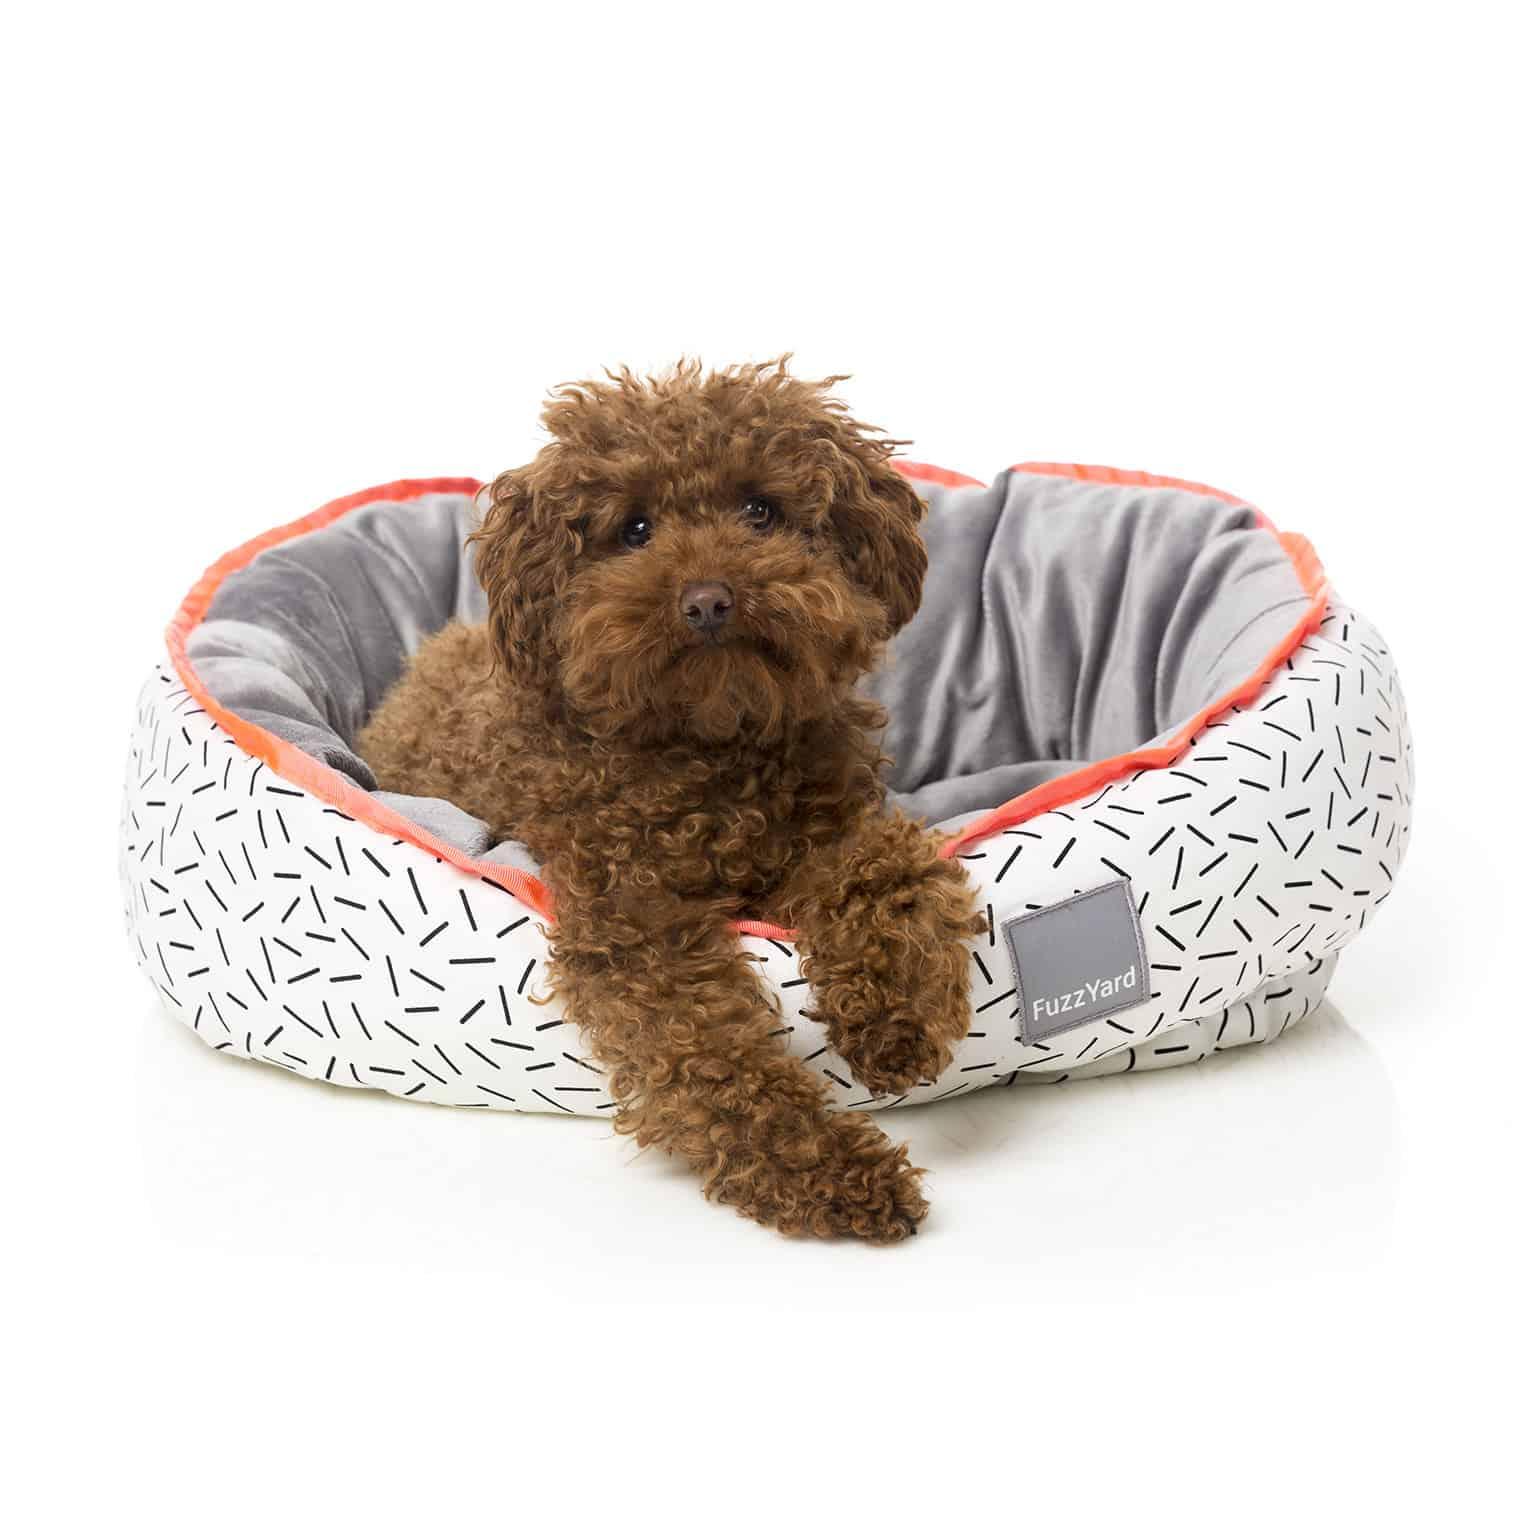 Fuzzyard Reversible Bed - Hustle